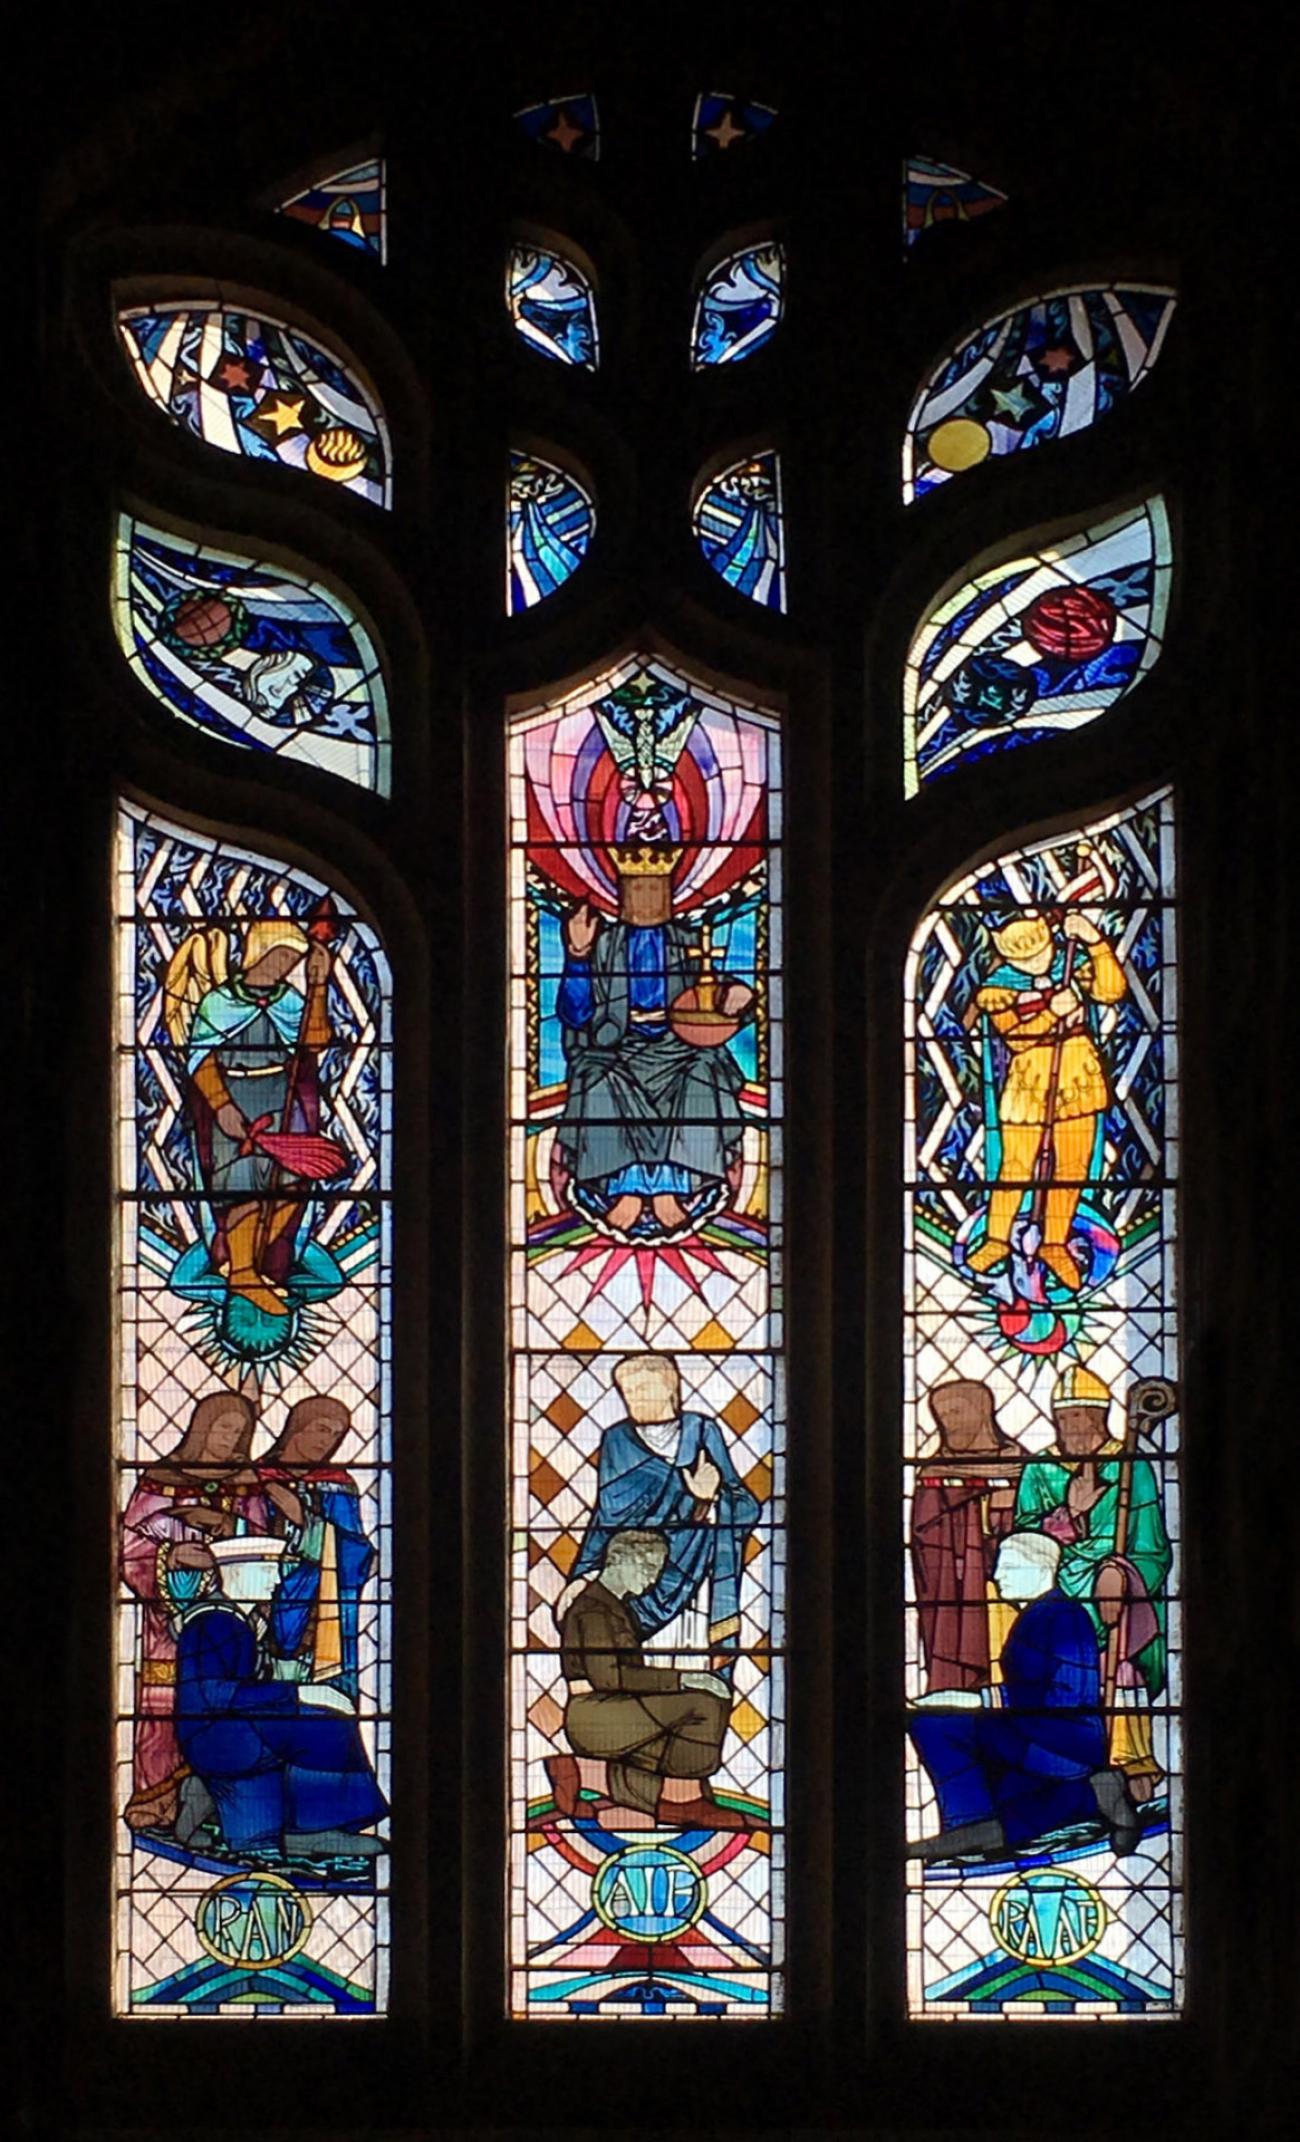 Saint George Anglican Church Memorial Windows, Parkes. Photograph provided by Cheryl Thompson, 2020.